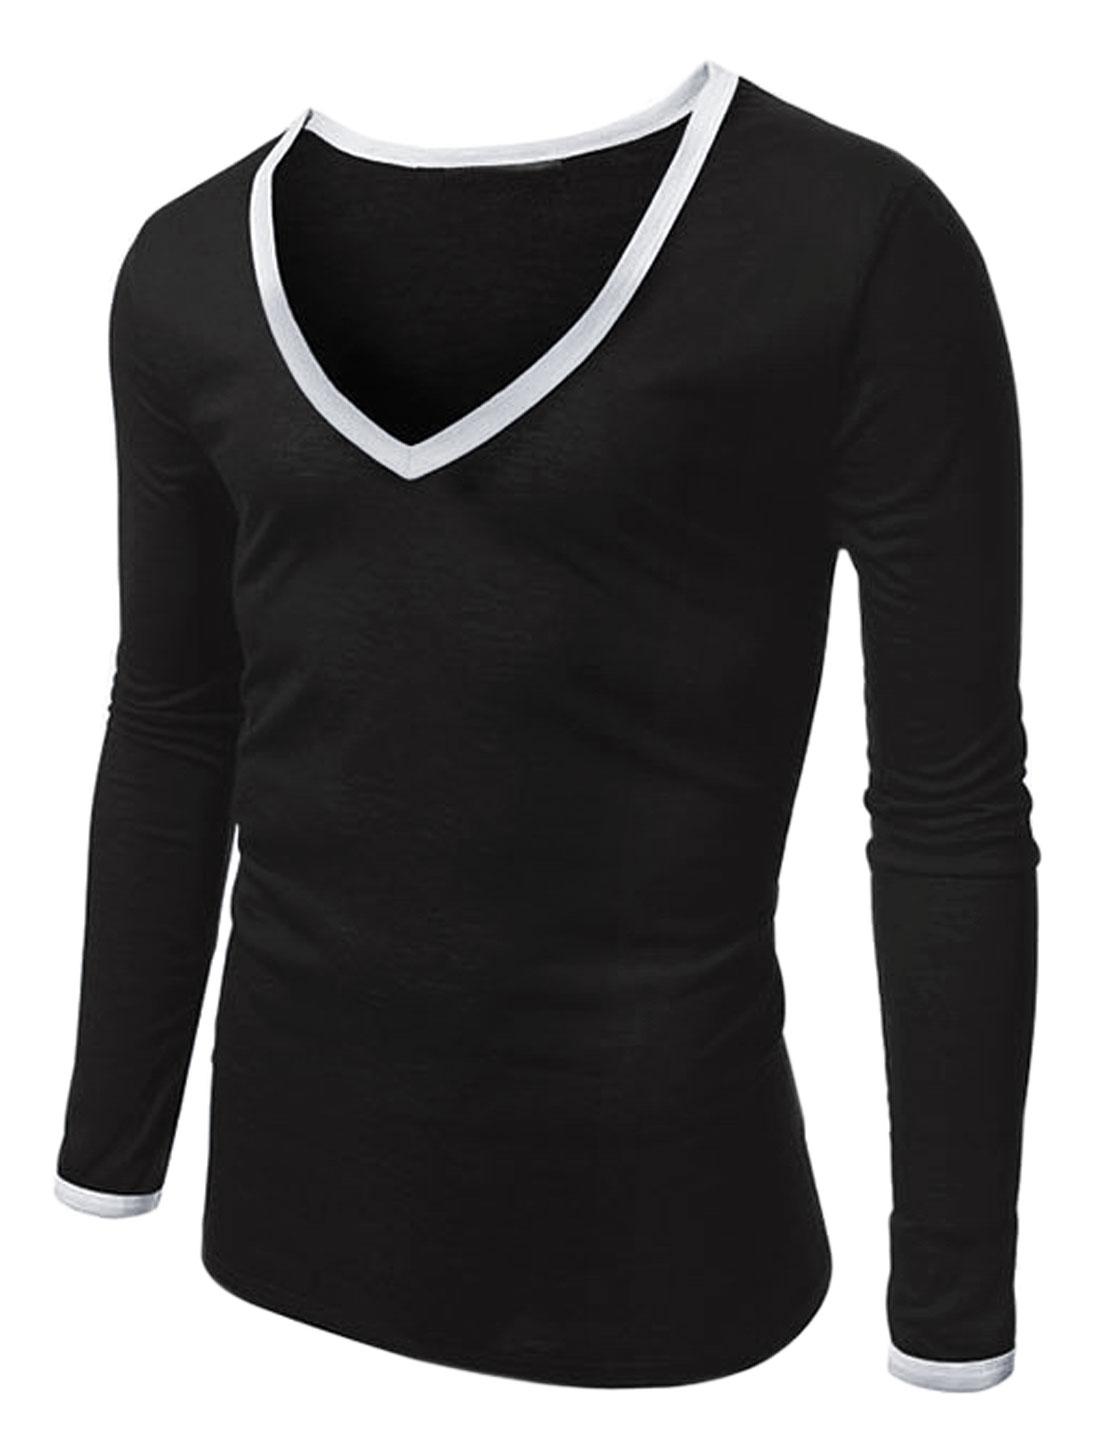 Men V Neck Long Sleeves Leisure Piped Tee Shirt Black M